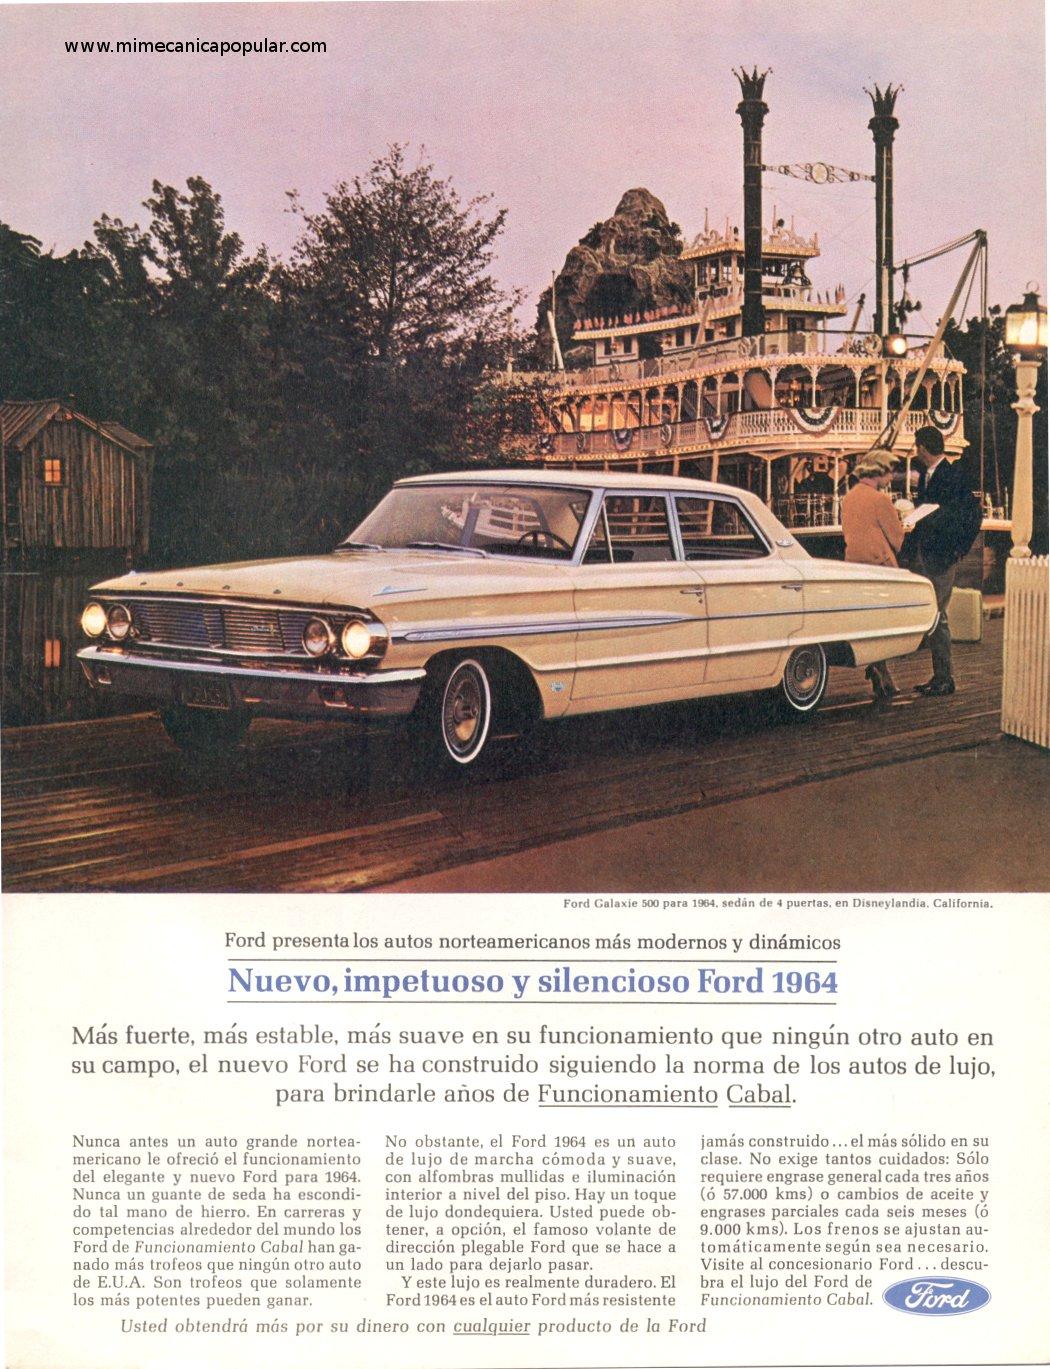 publicidad_ford_galaxie_500_febrero_1964-01.jpg